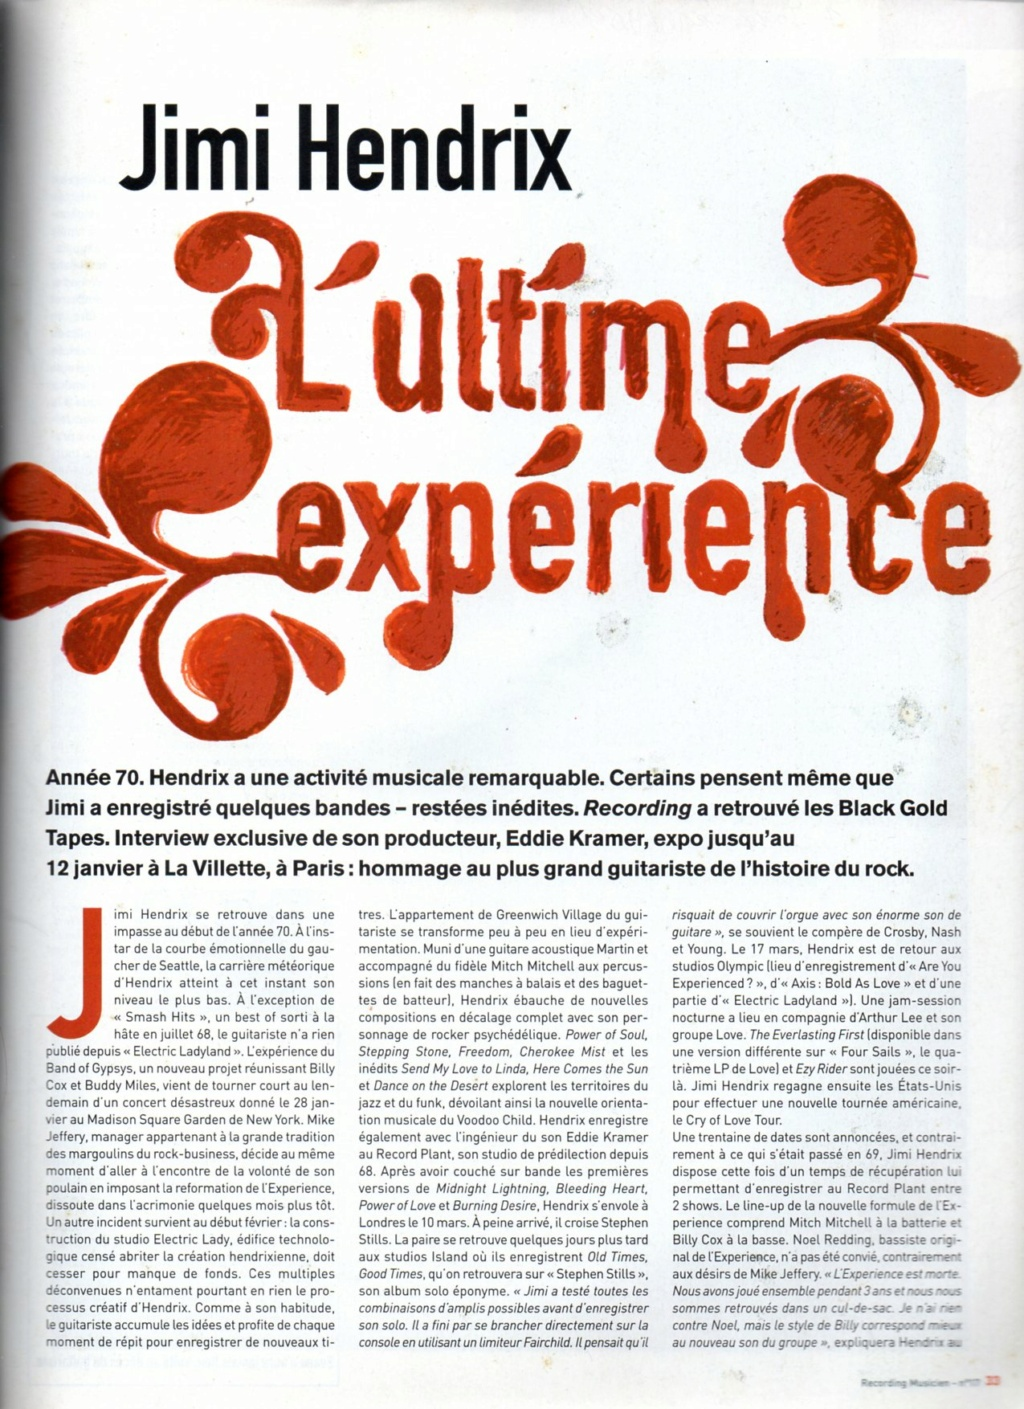 Magazines Français 1989 - 2014 - Page 2 Record11